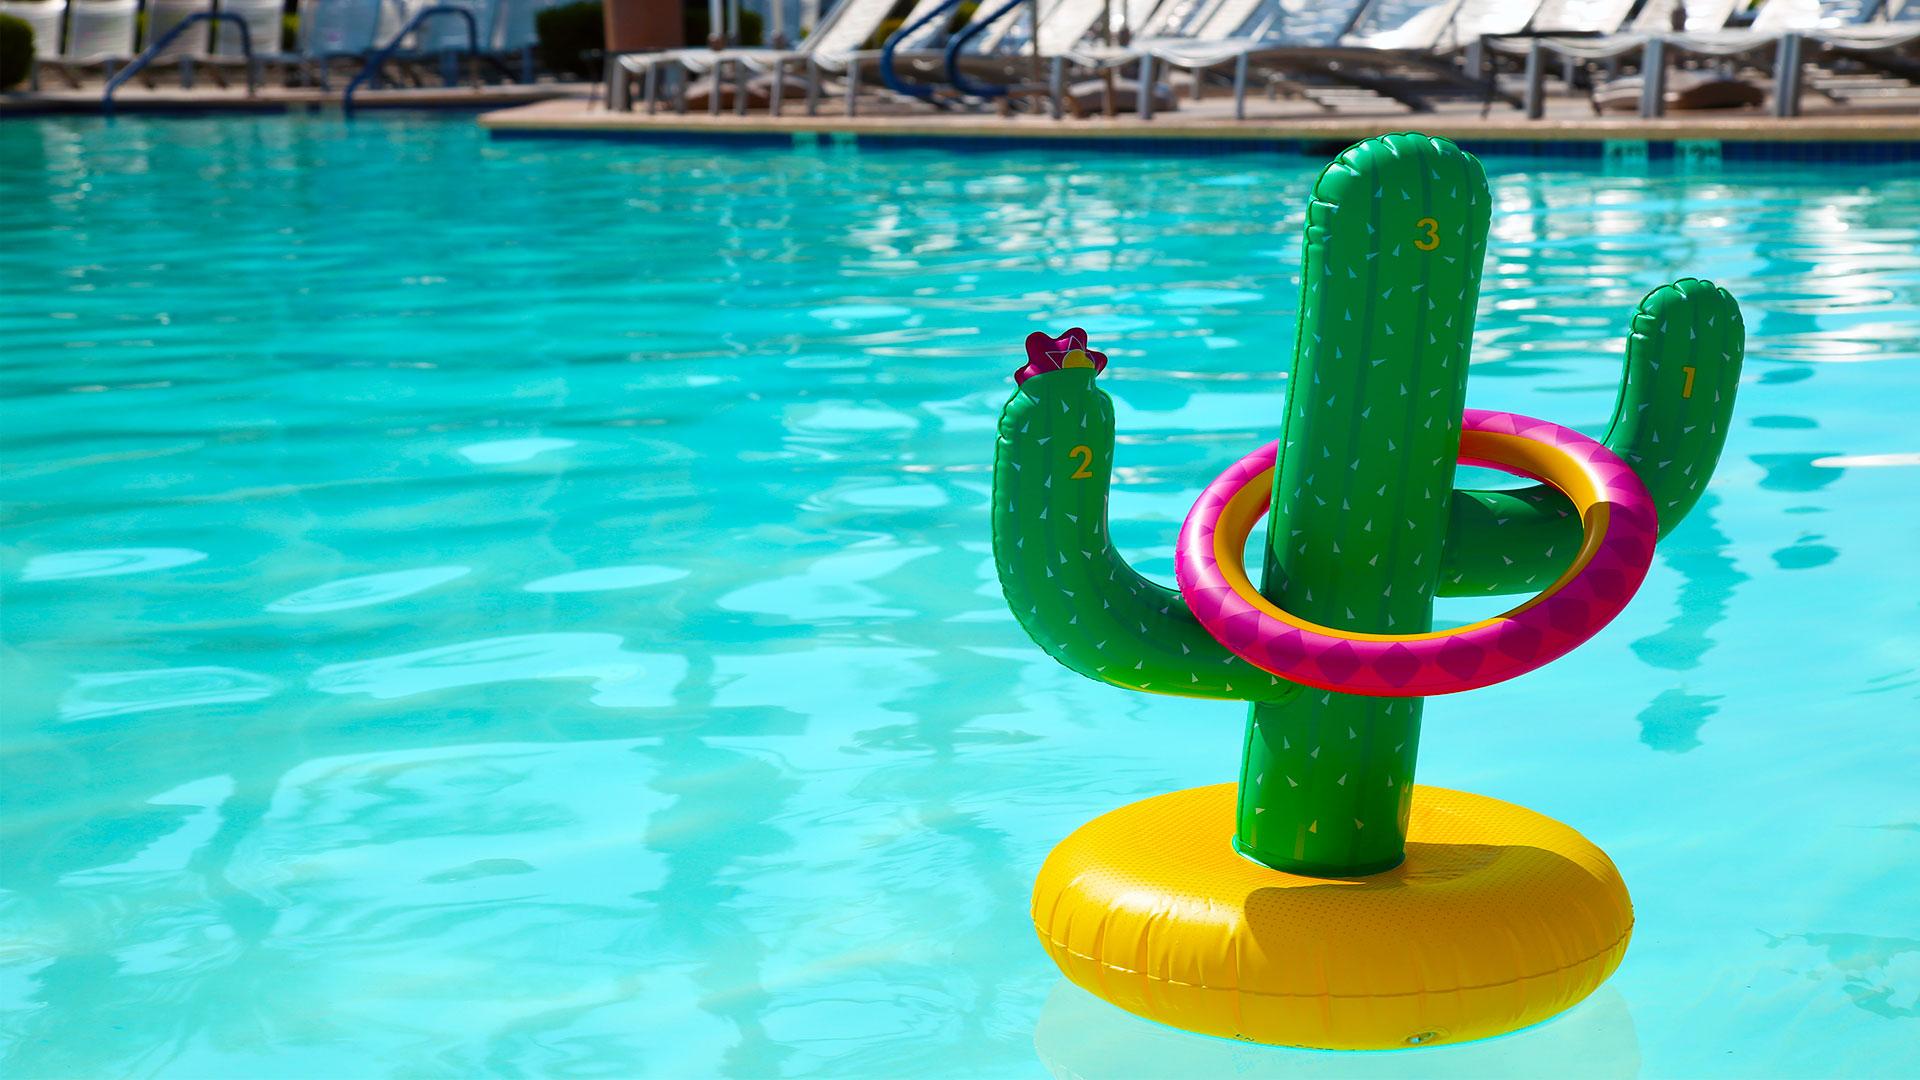 pool party - The Ark Magazine